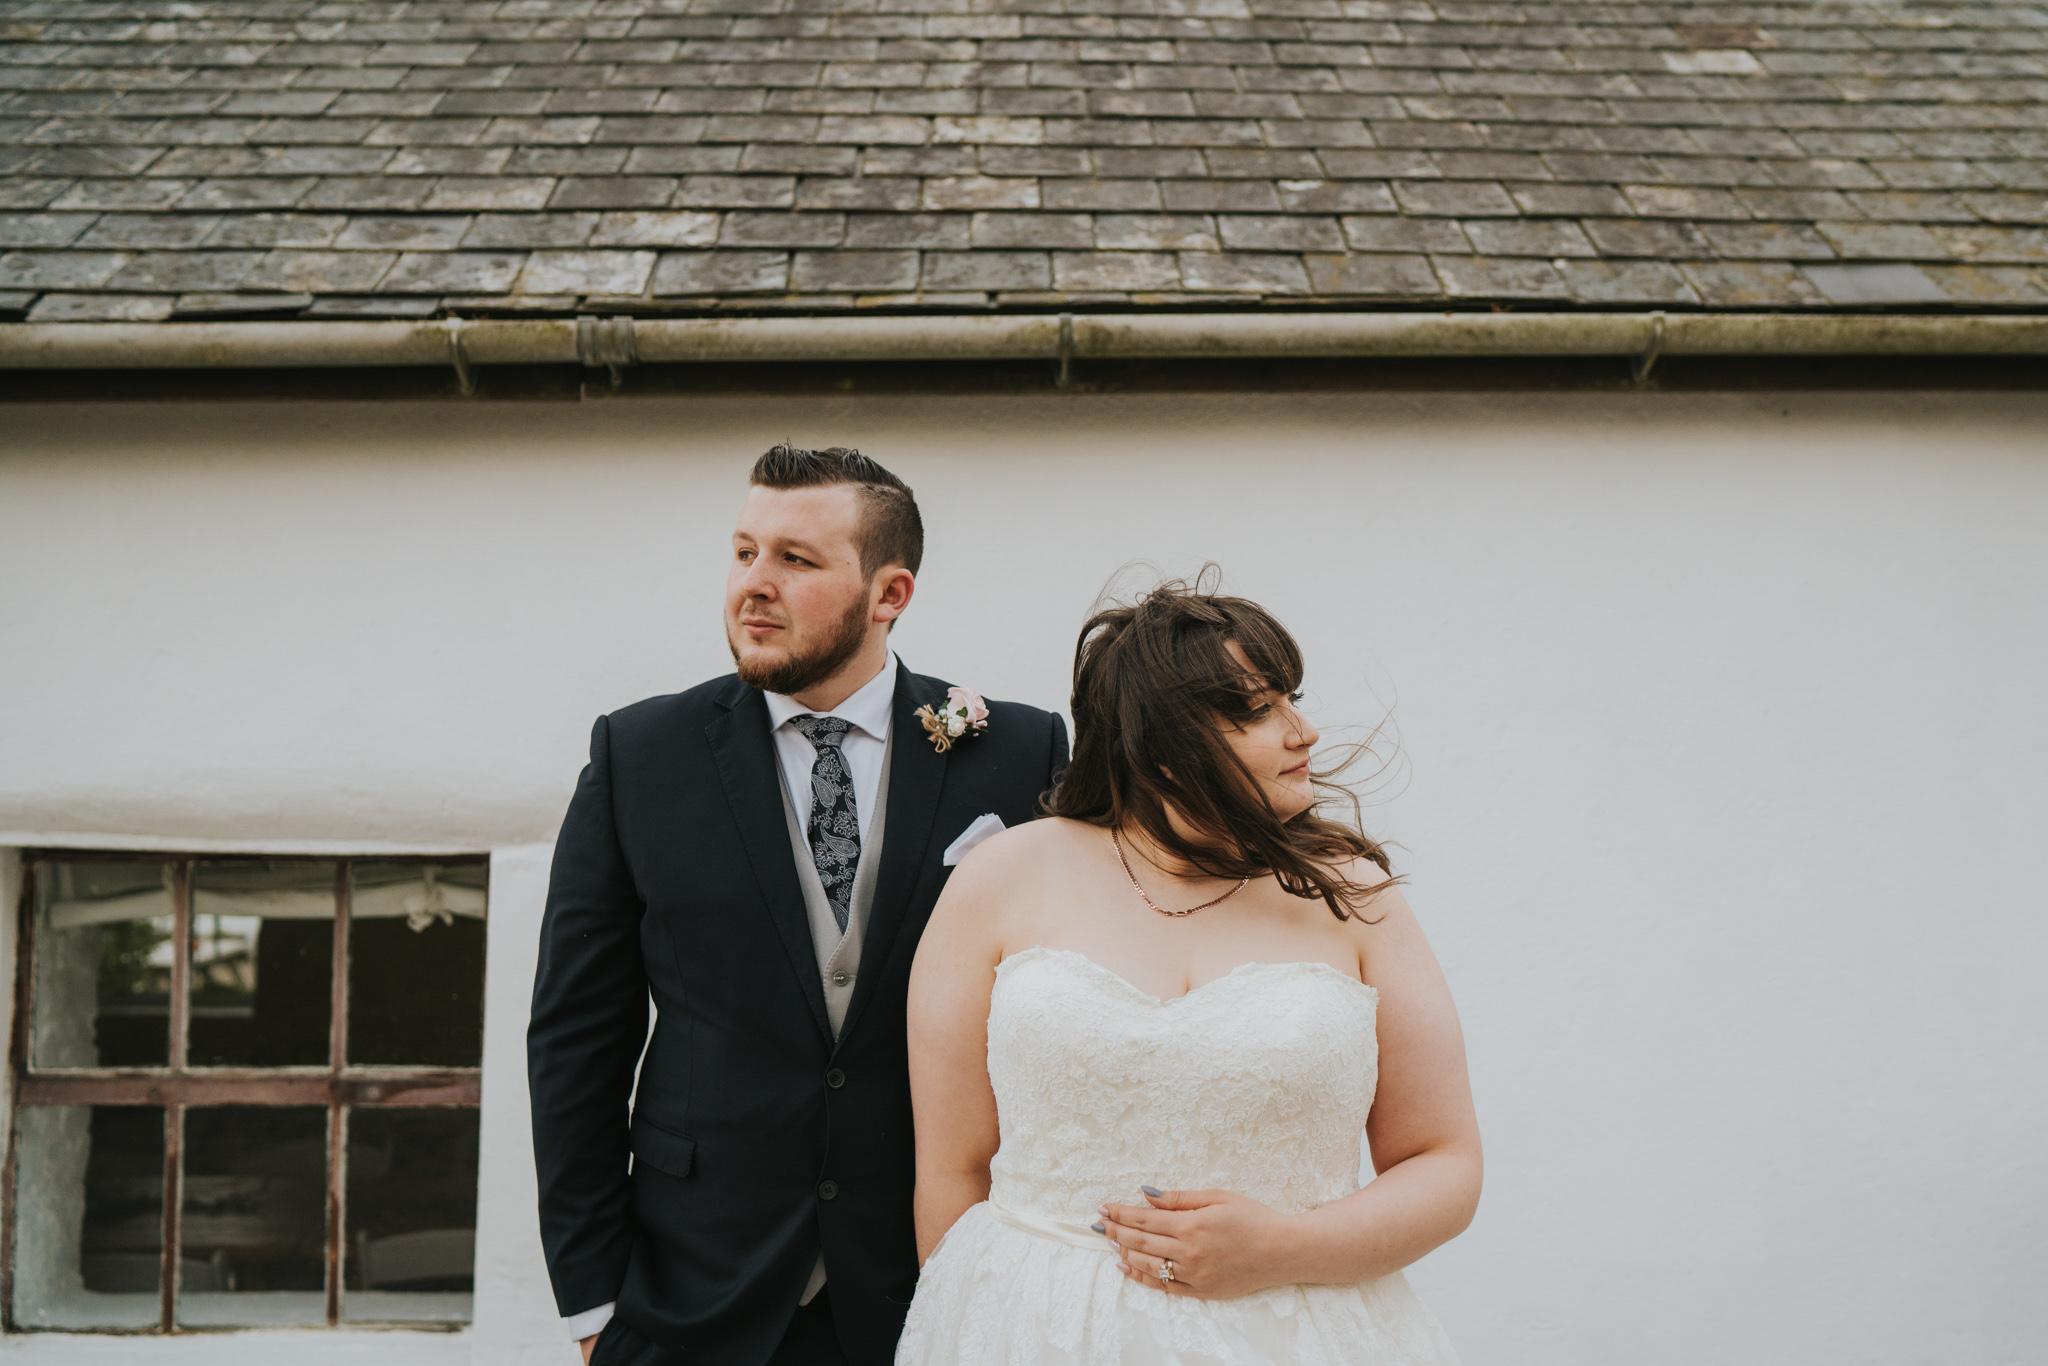 grace-sam-old-barn-clovelly-devon-wedding-photographer-grace-elizabeth-essex-suffolk-norfolk-wedding-photographer (113 of 132).jpg